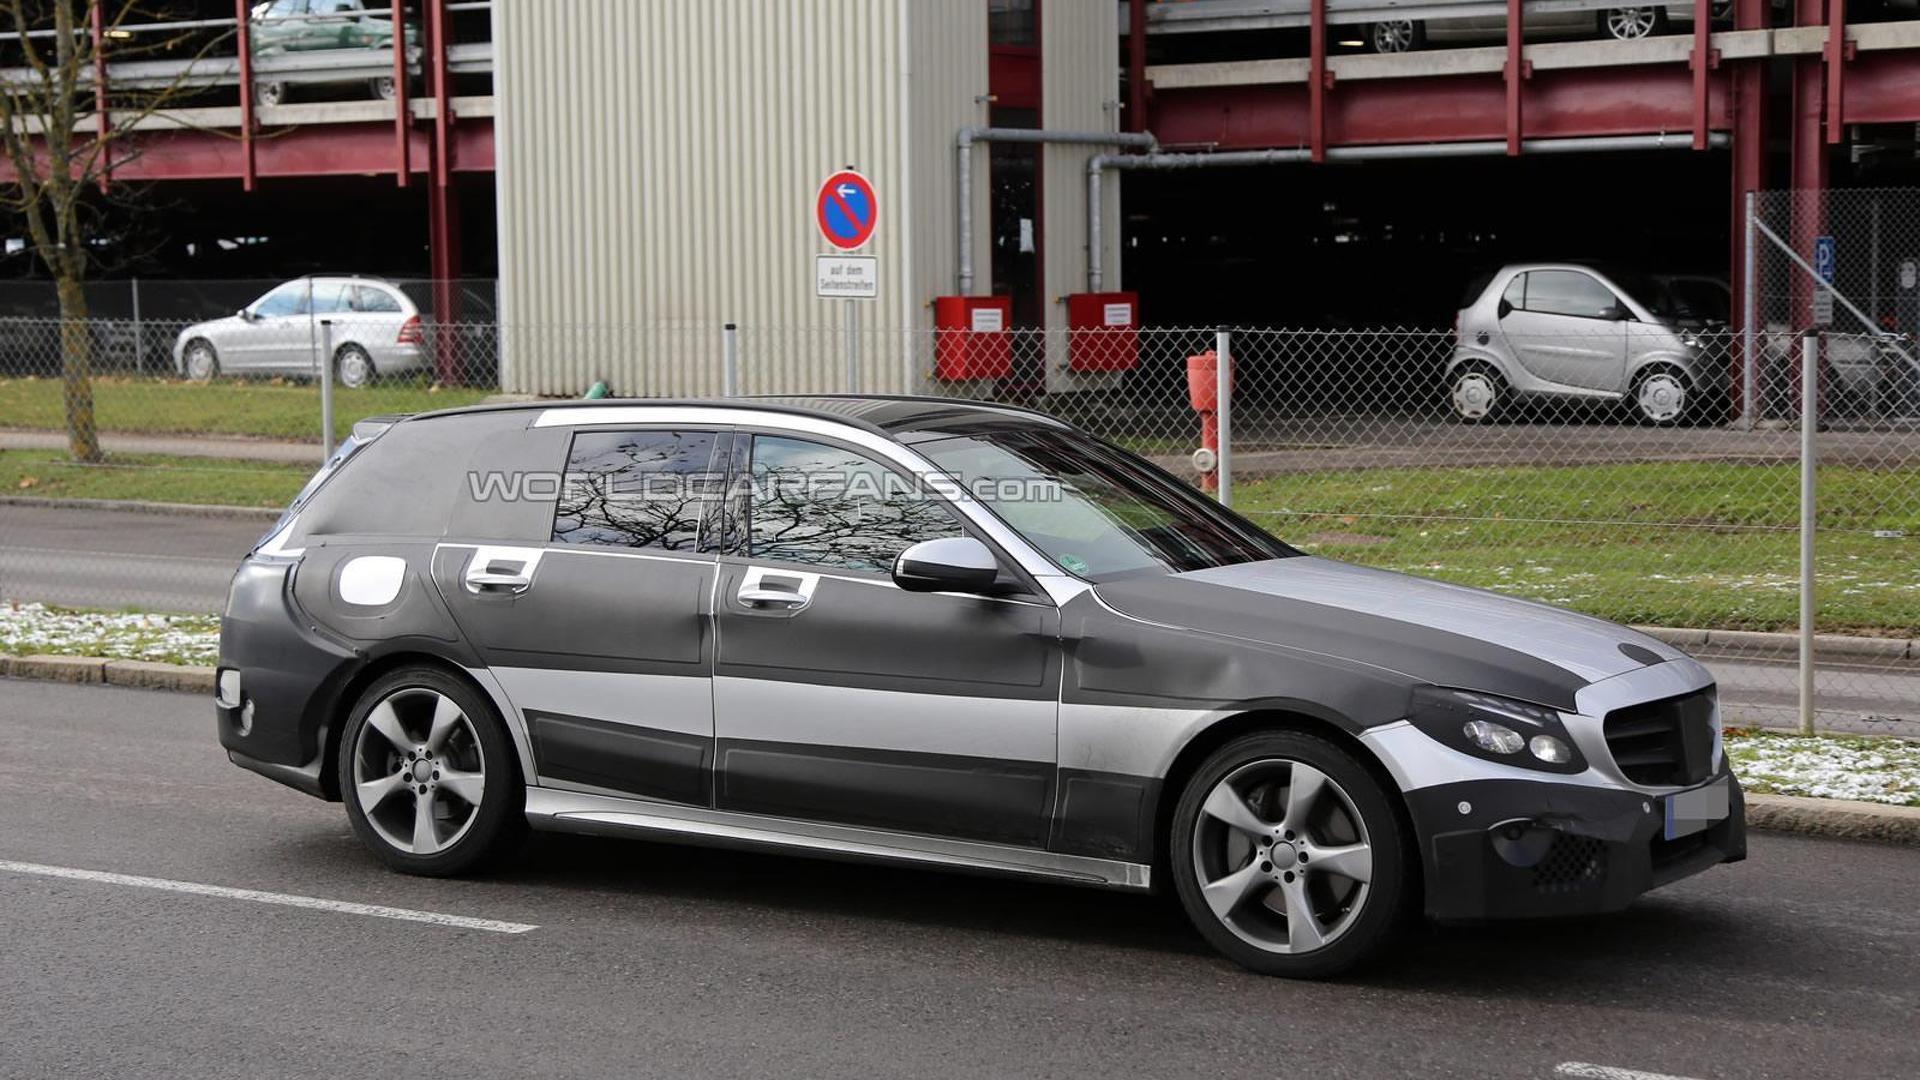 2015 Mercedes-Benz C-Class Estate returns in new spy pics